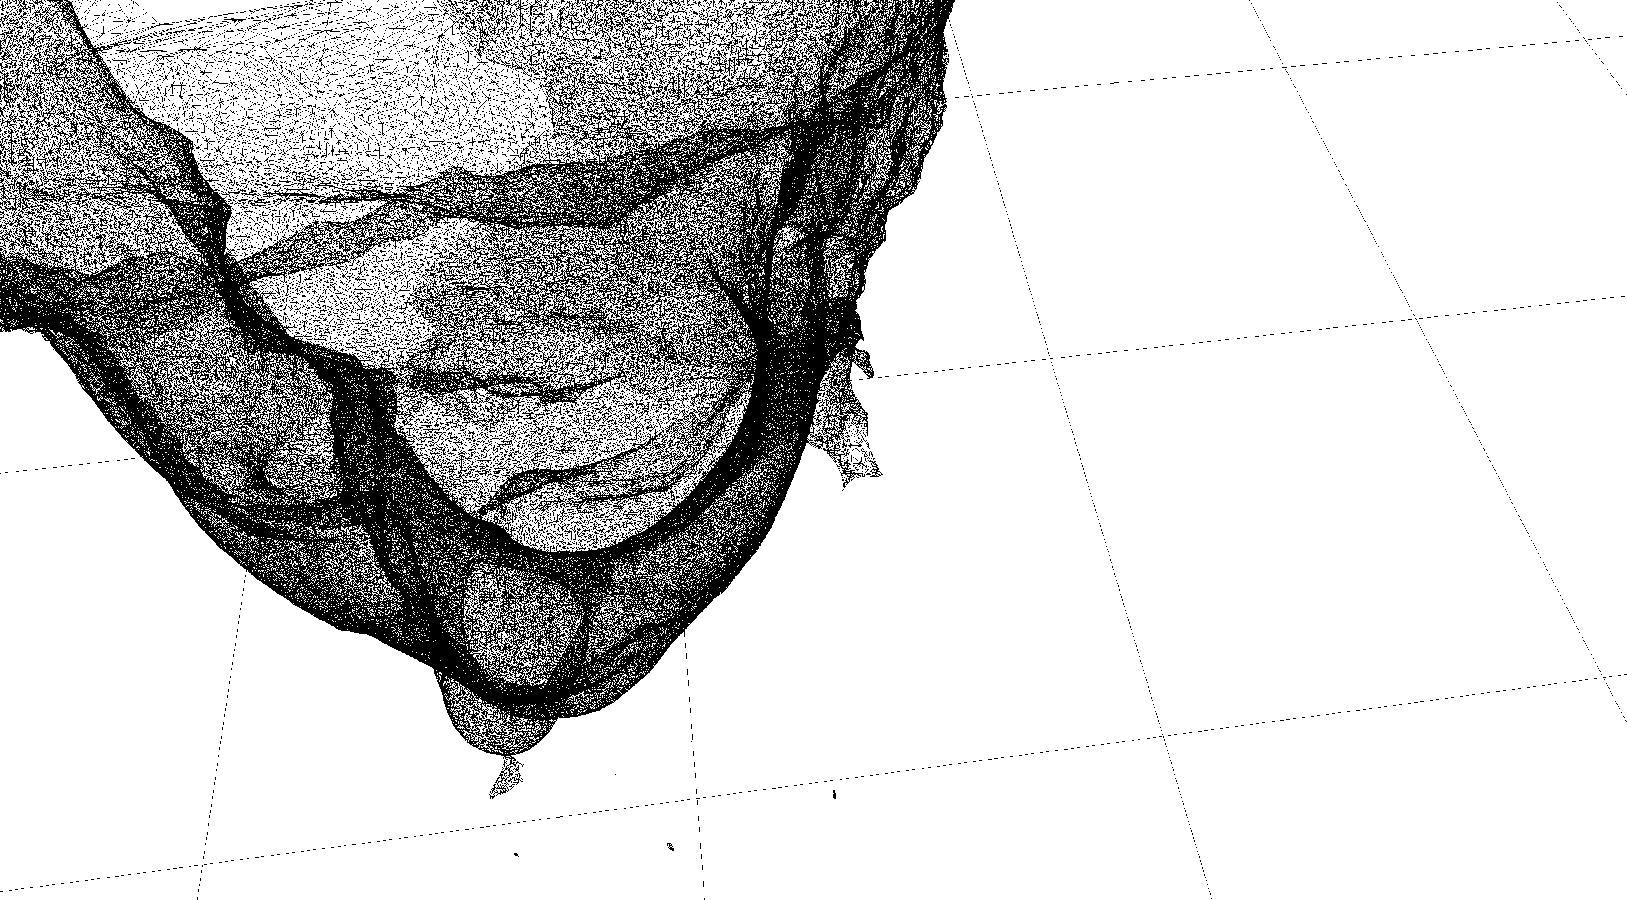 Developing 3D scans, 2018, August Experiments, Jane Elizabeth Bennett